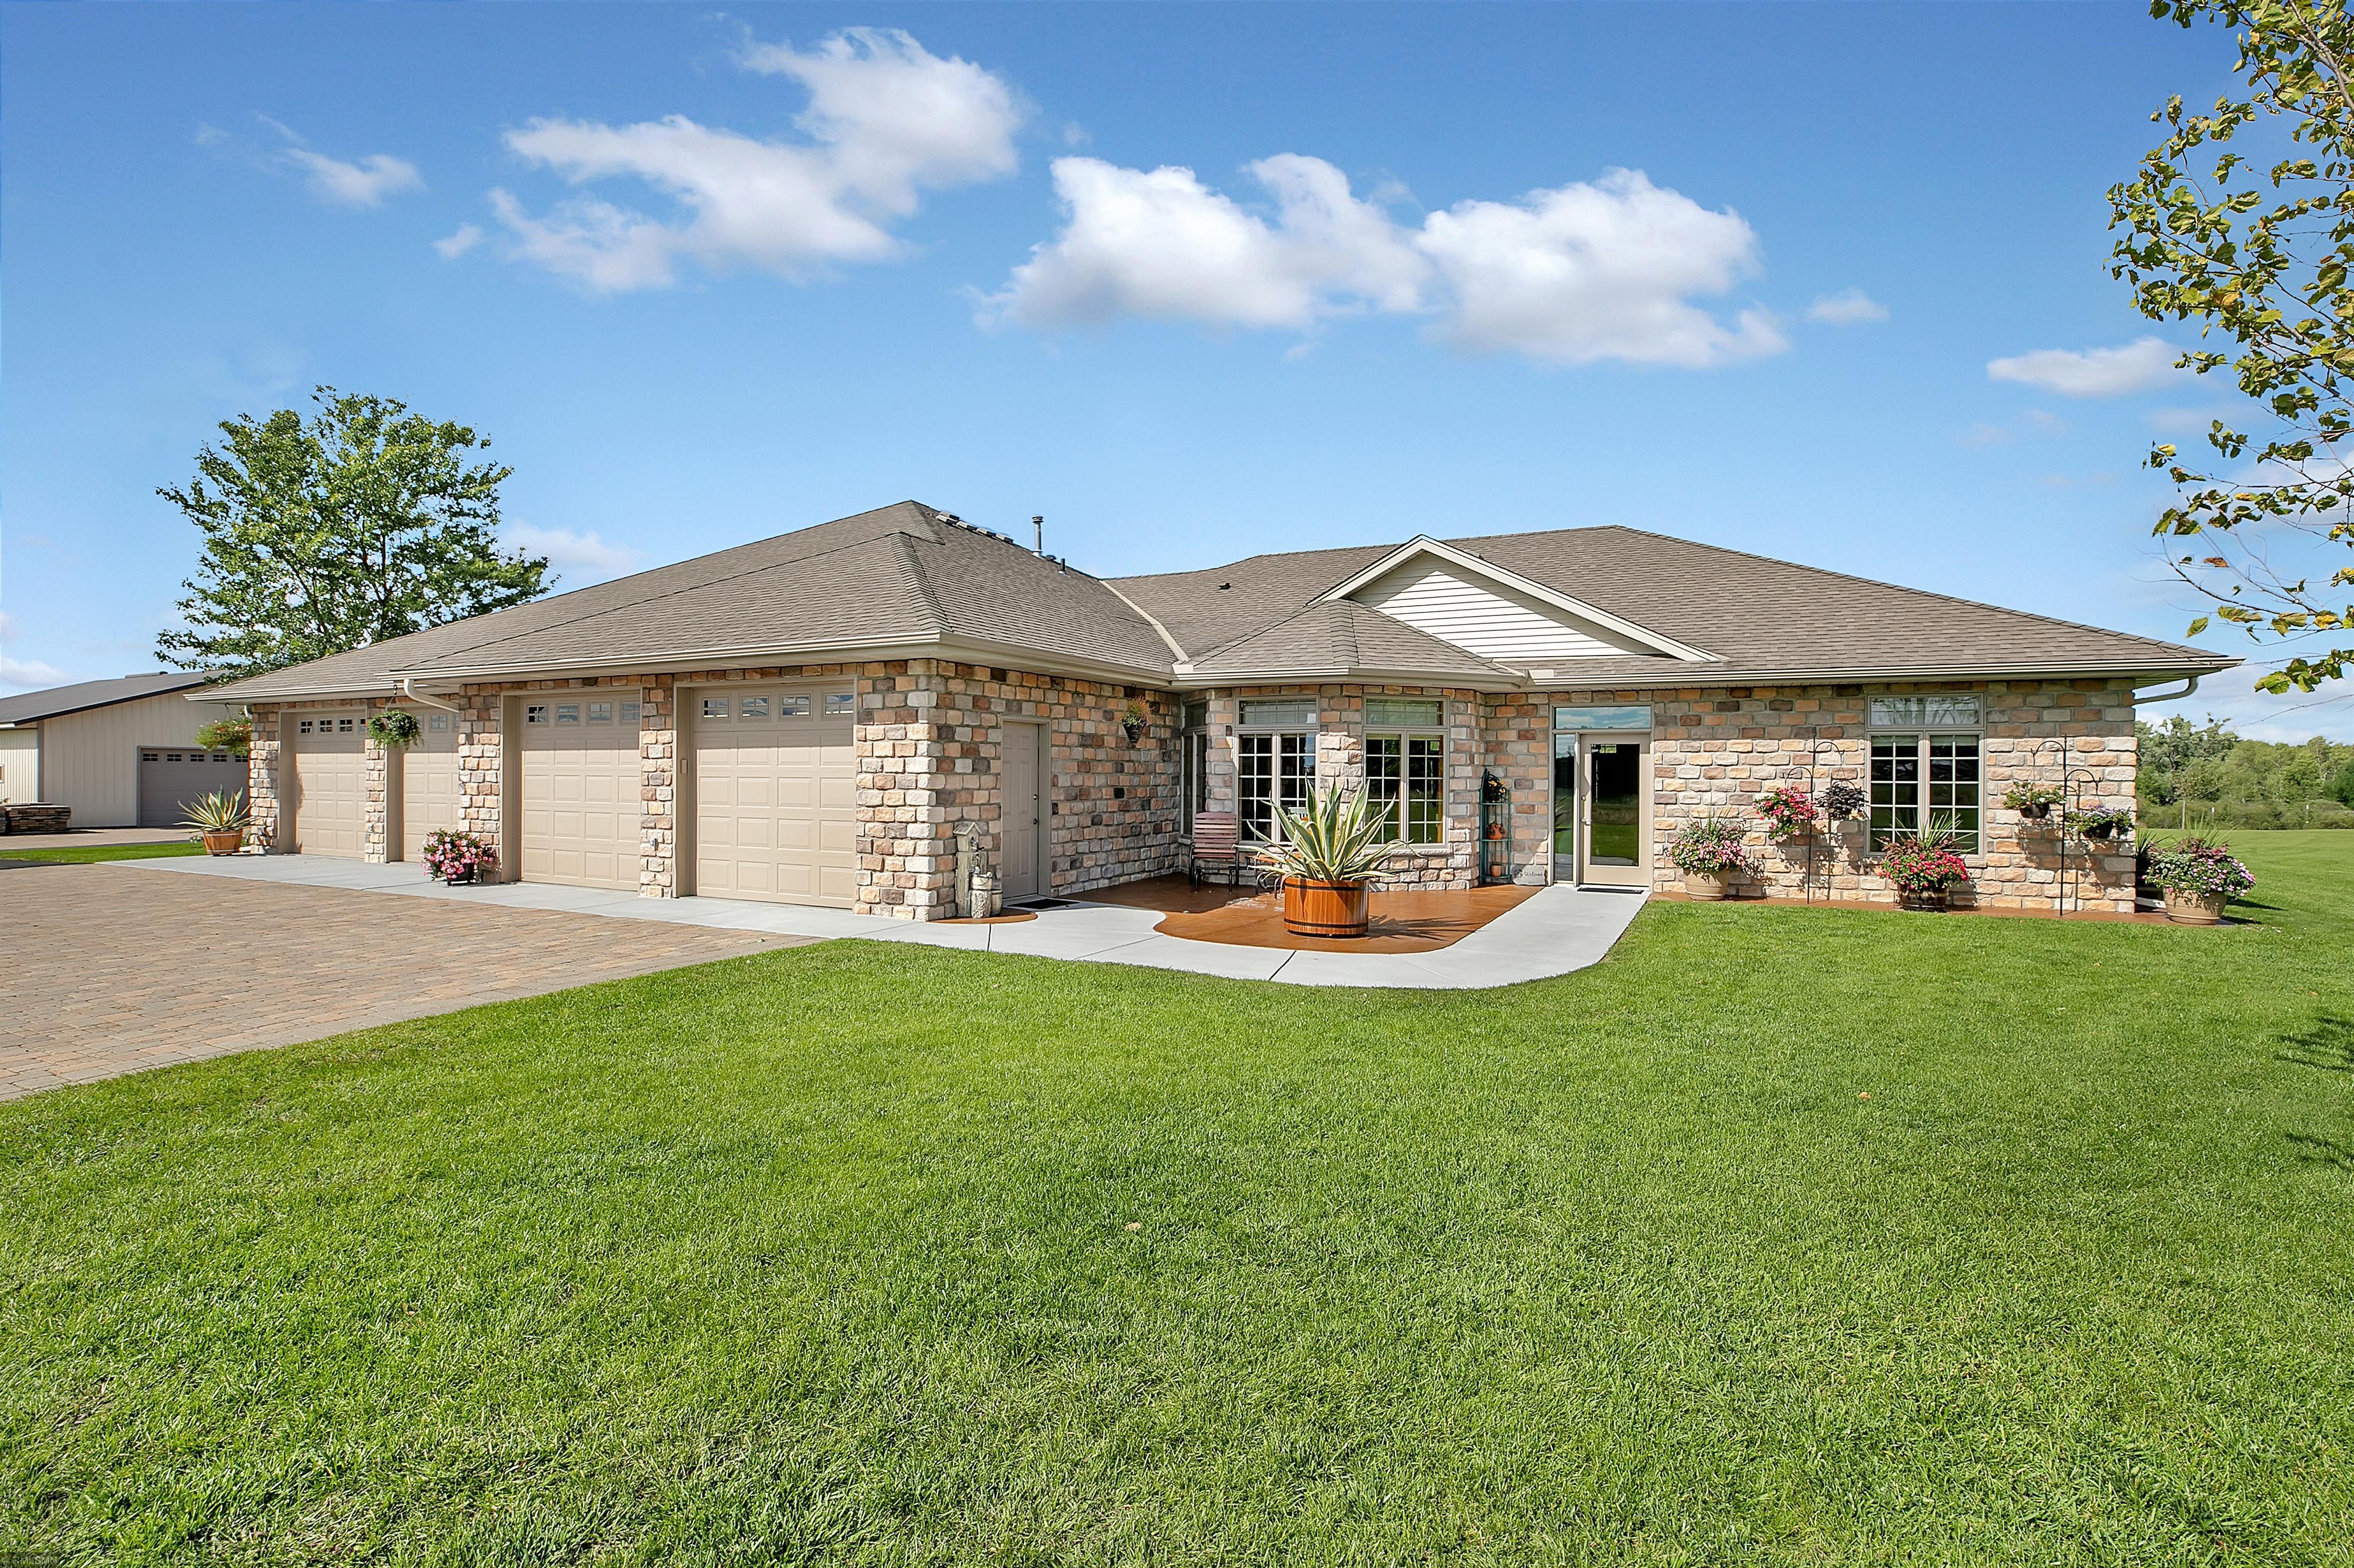 2440 105th Avenue Property Photo - Princeton, MN real estate listing